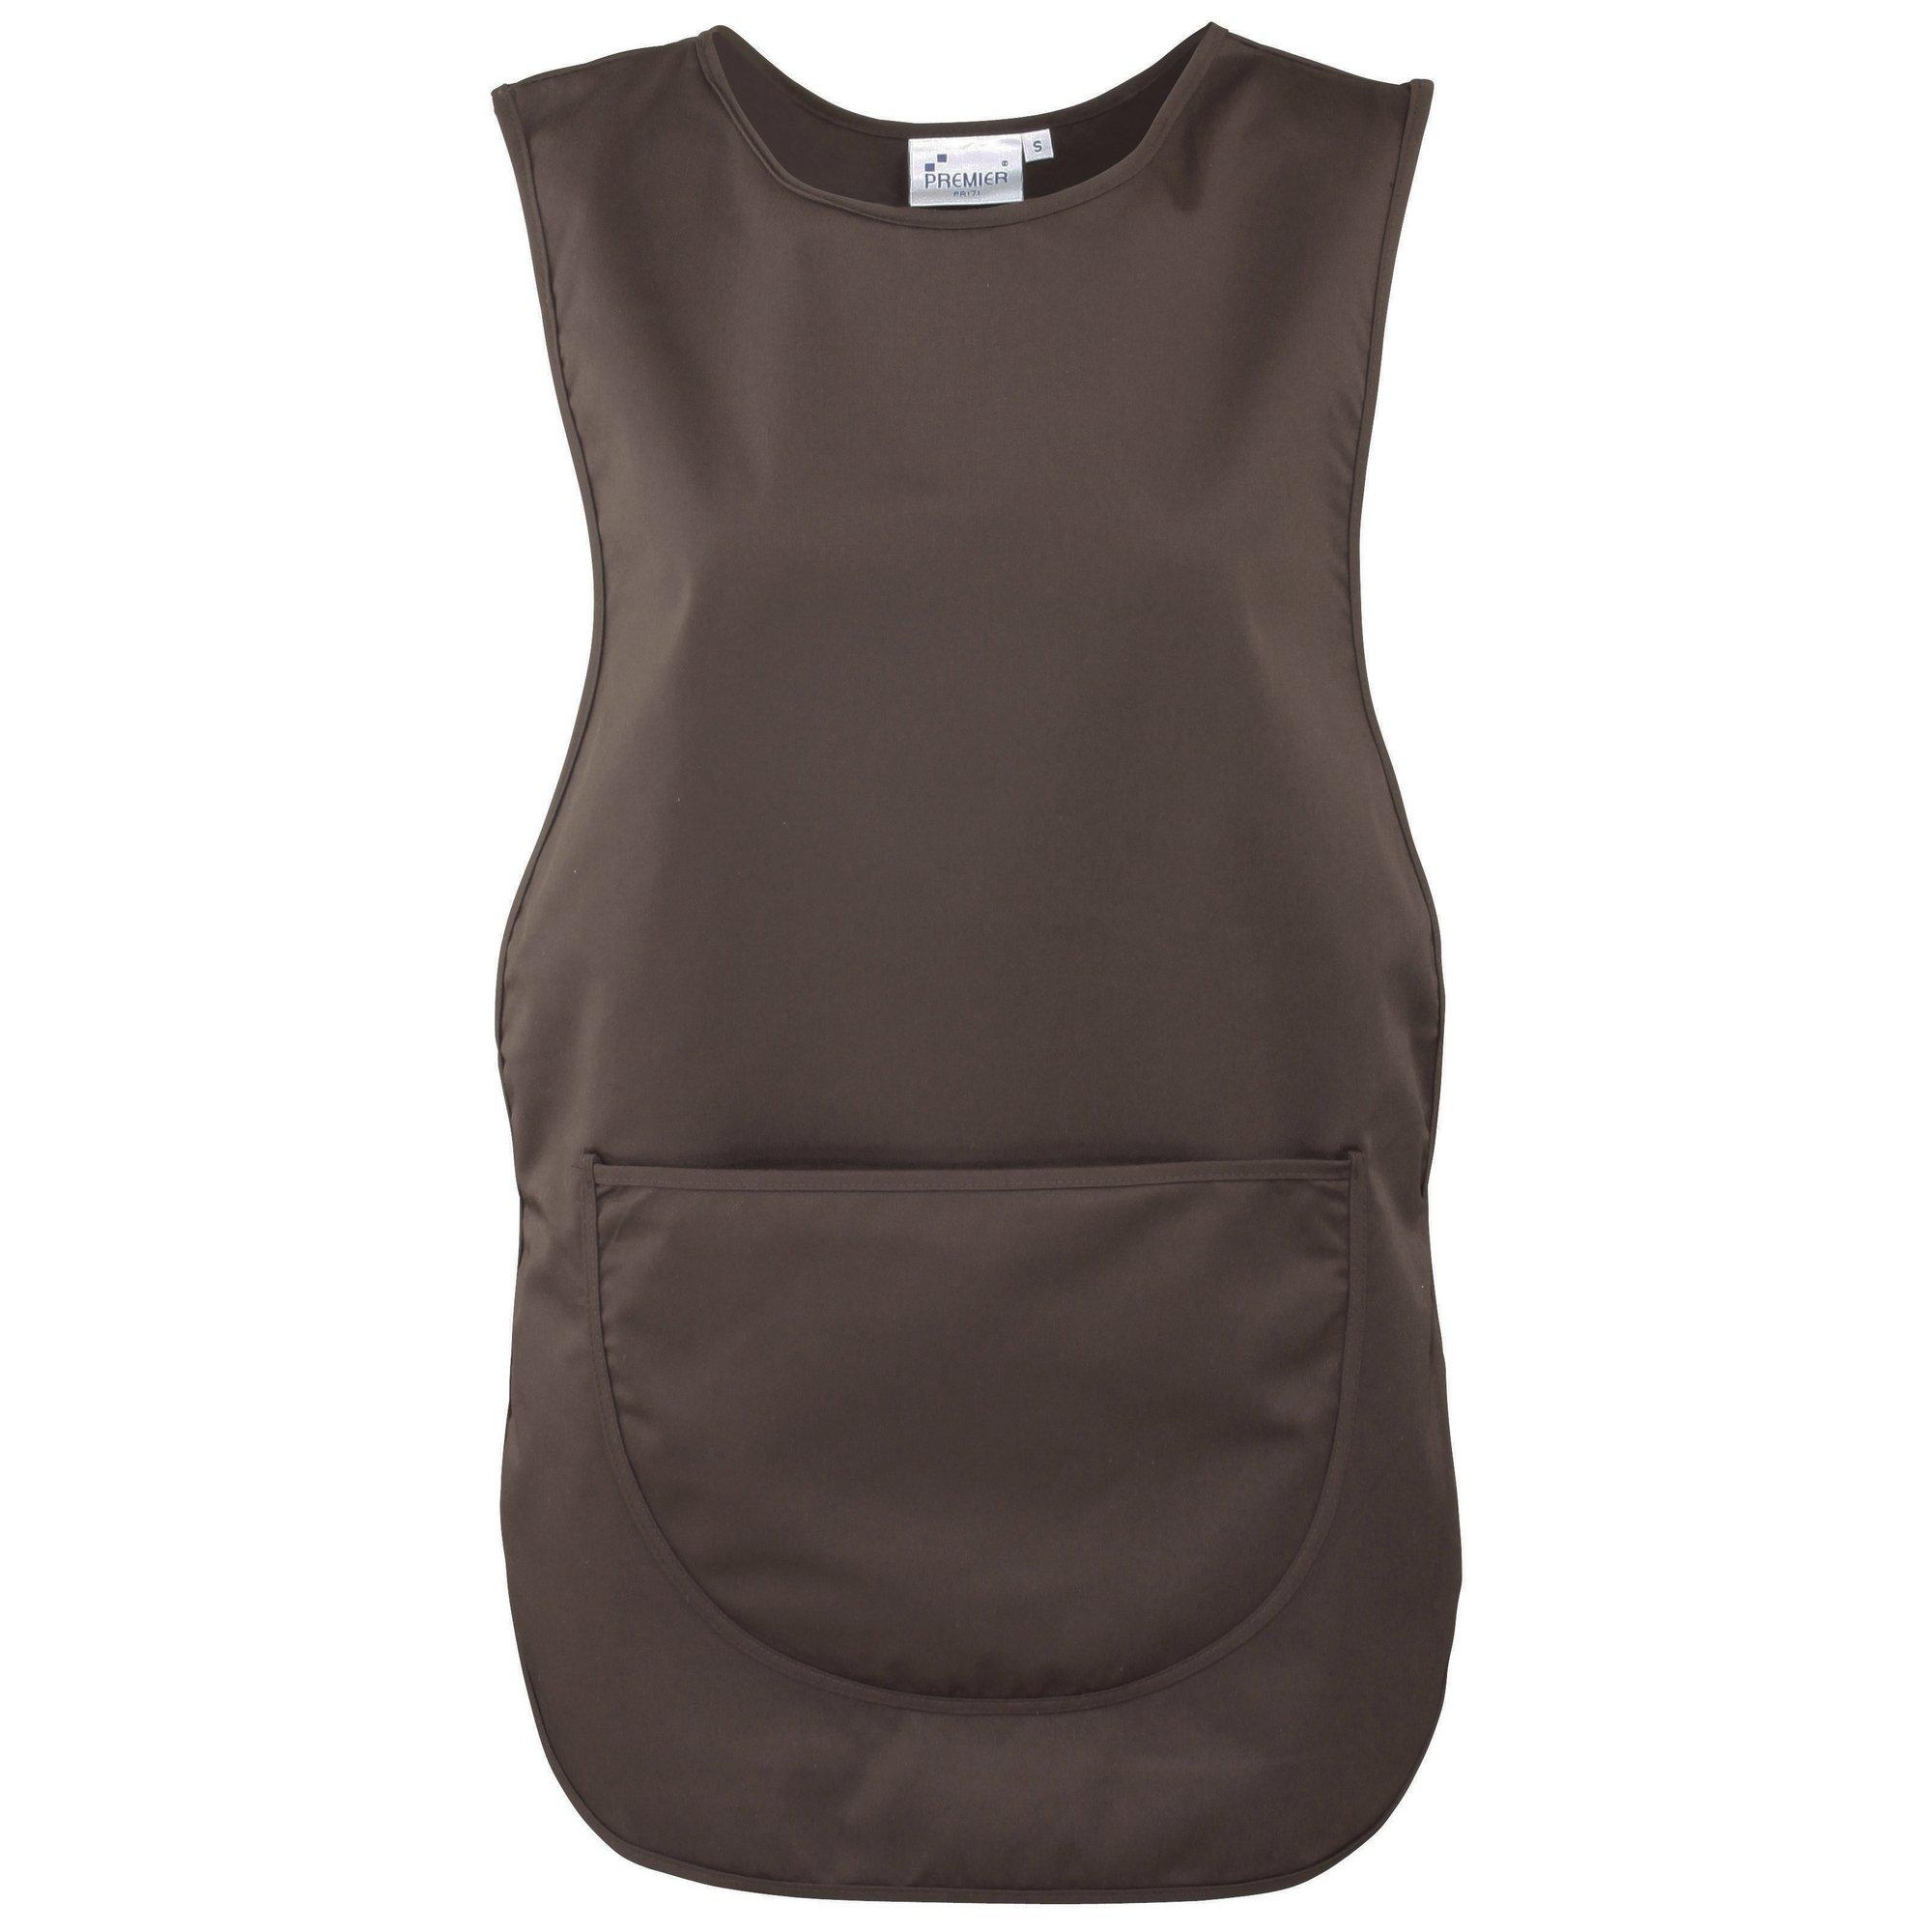 Premier Ladies/Womens Pocket Tabard/Workwear (3XL) (Brown) by Premier